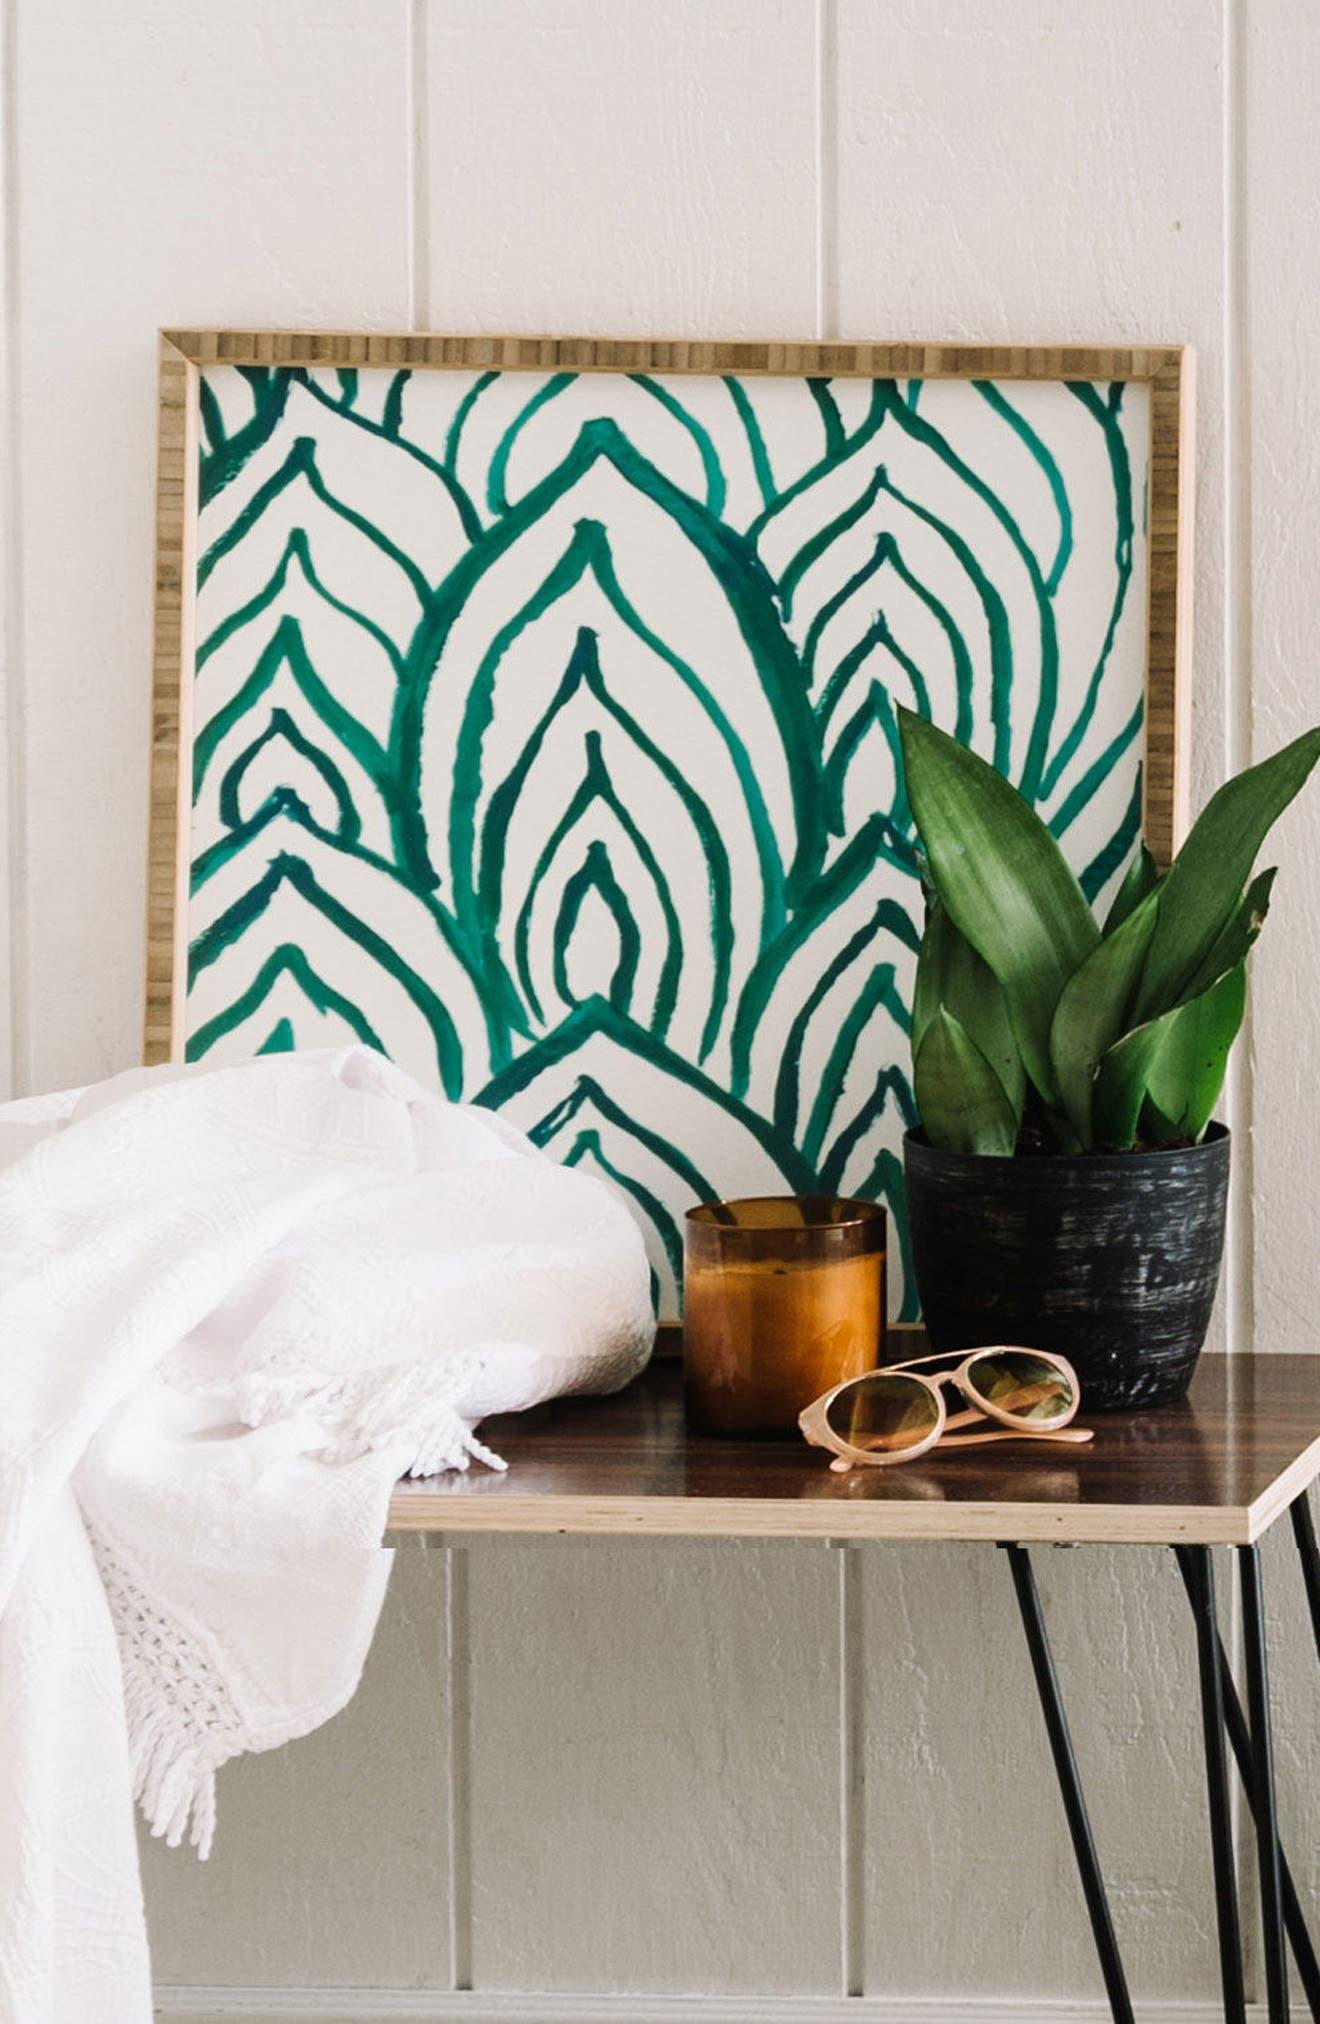 'Emerald Coast' Framed Wall Art,                             Alternate thumbnail 4, color,                             Green